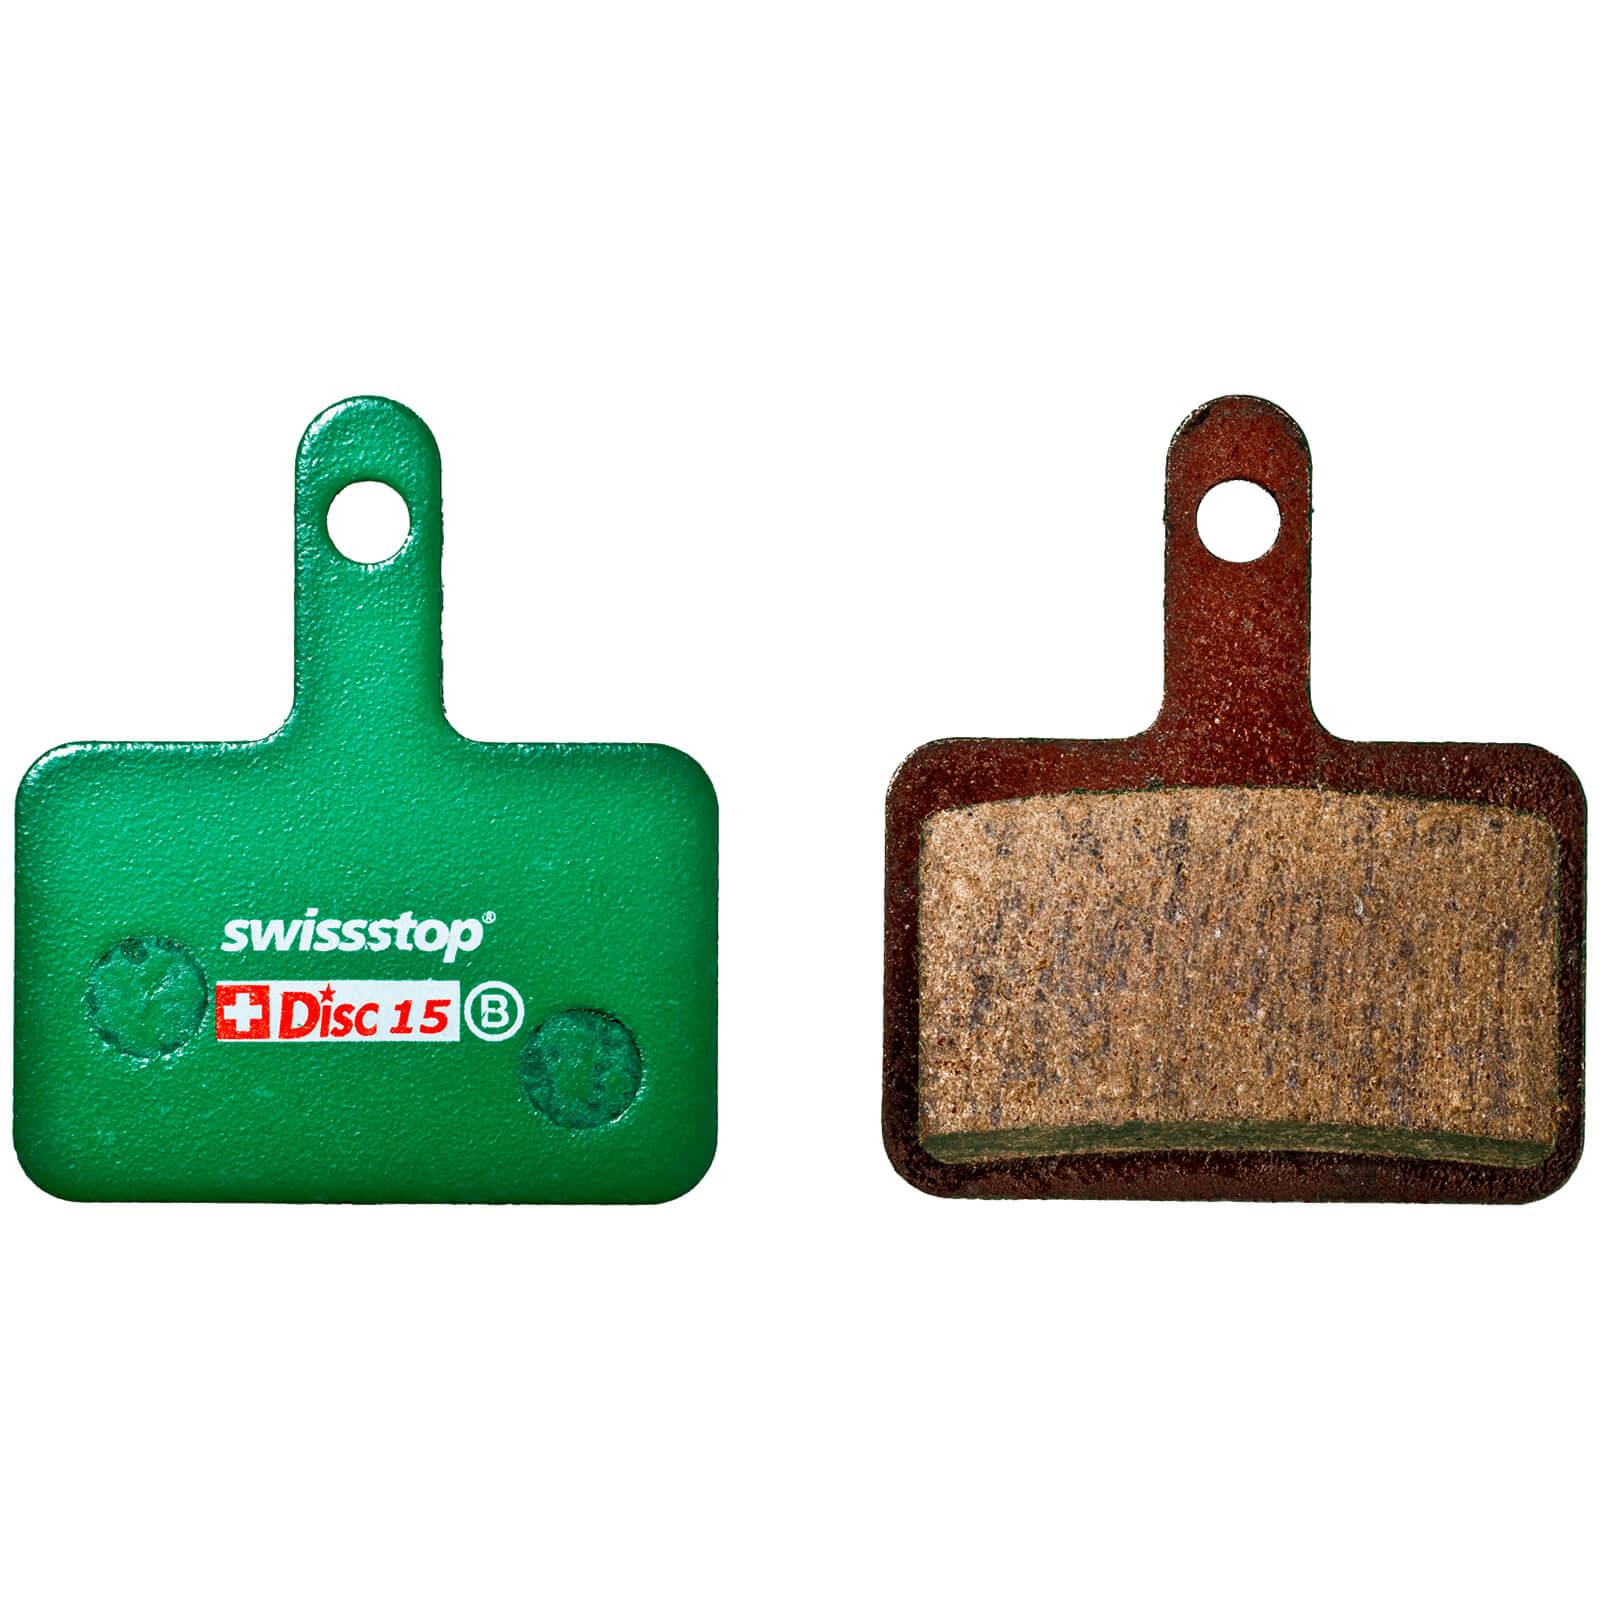 Swissstop Organic Disc Brake Pads - Disc 15